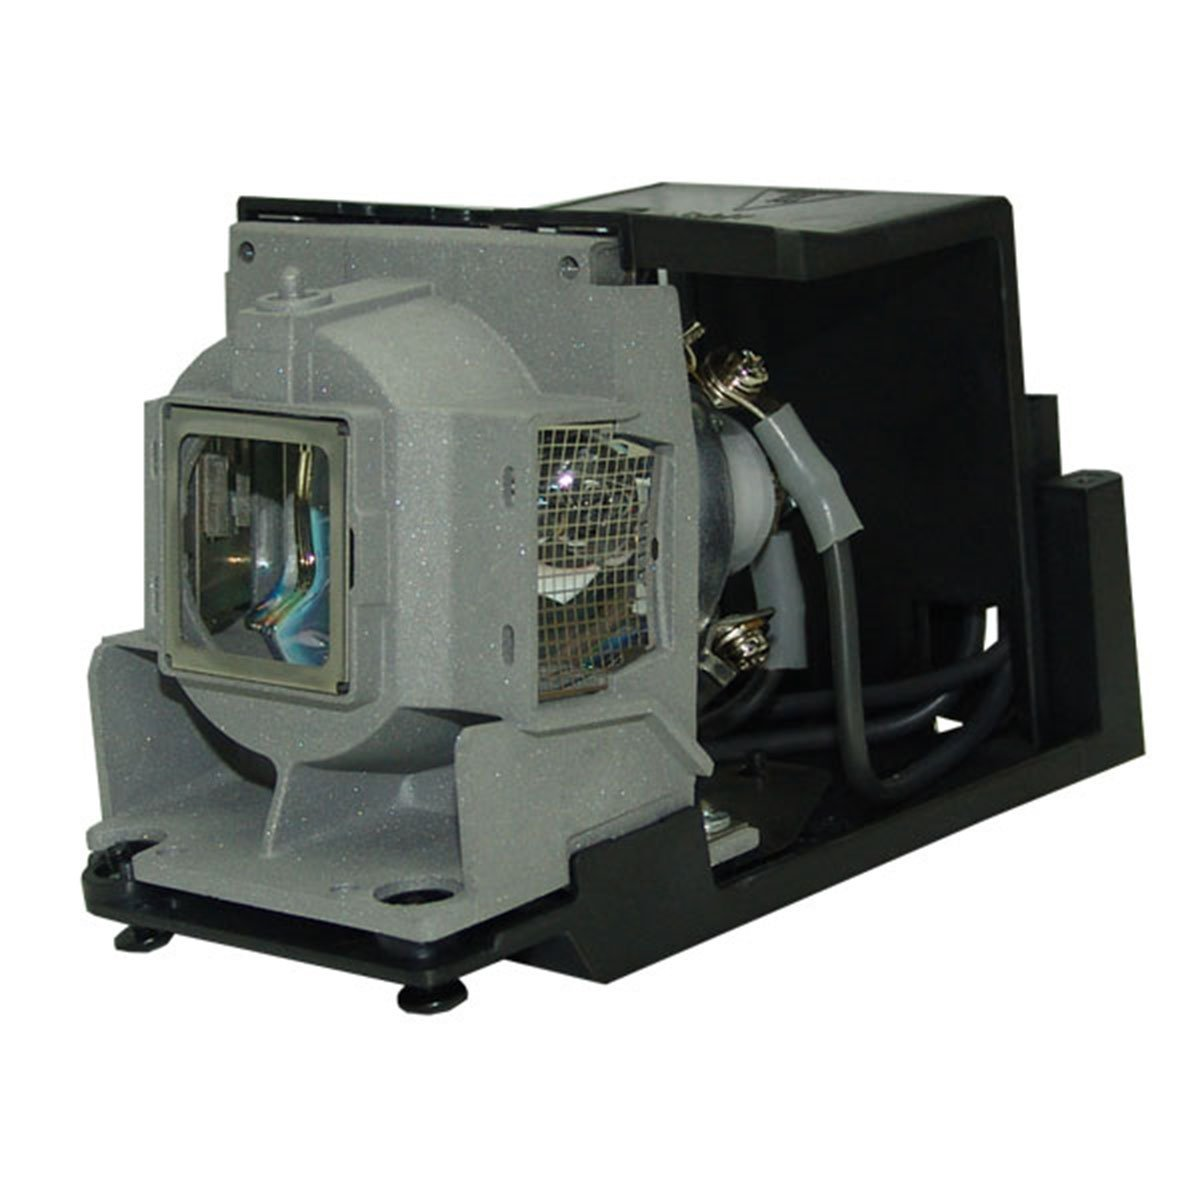 Projector Lamp Bulb TLPLW23 TLP-LW23 for TOSHIBA TDP-T360 TDP-T420 TDP-TW420 with housing projector lamp for toshiba tlp 471 bulb p n tlplu6 150w uhp id lmp3558